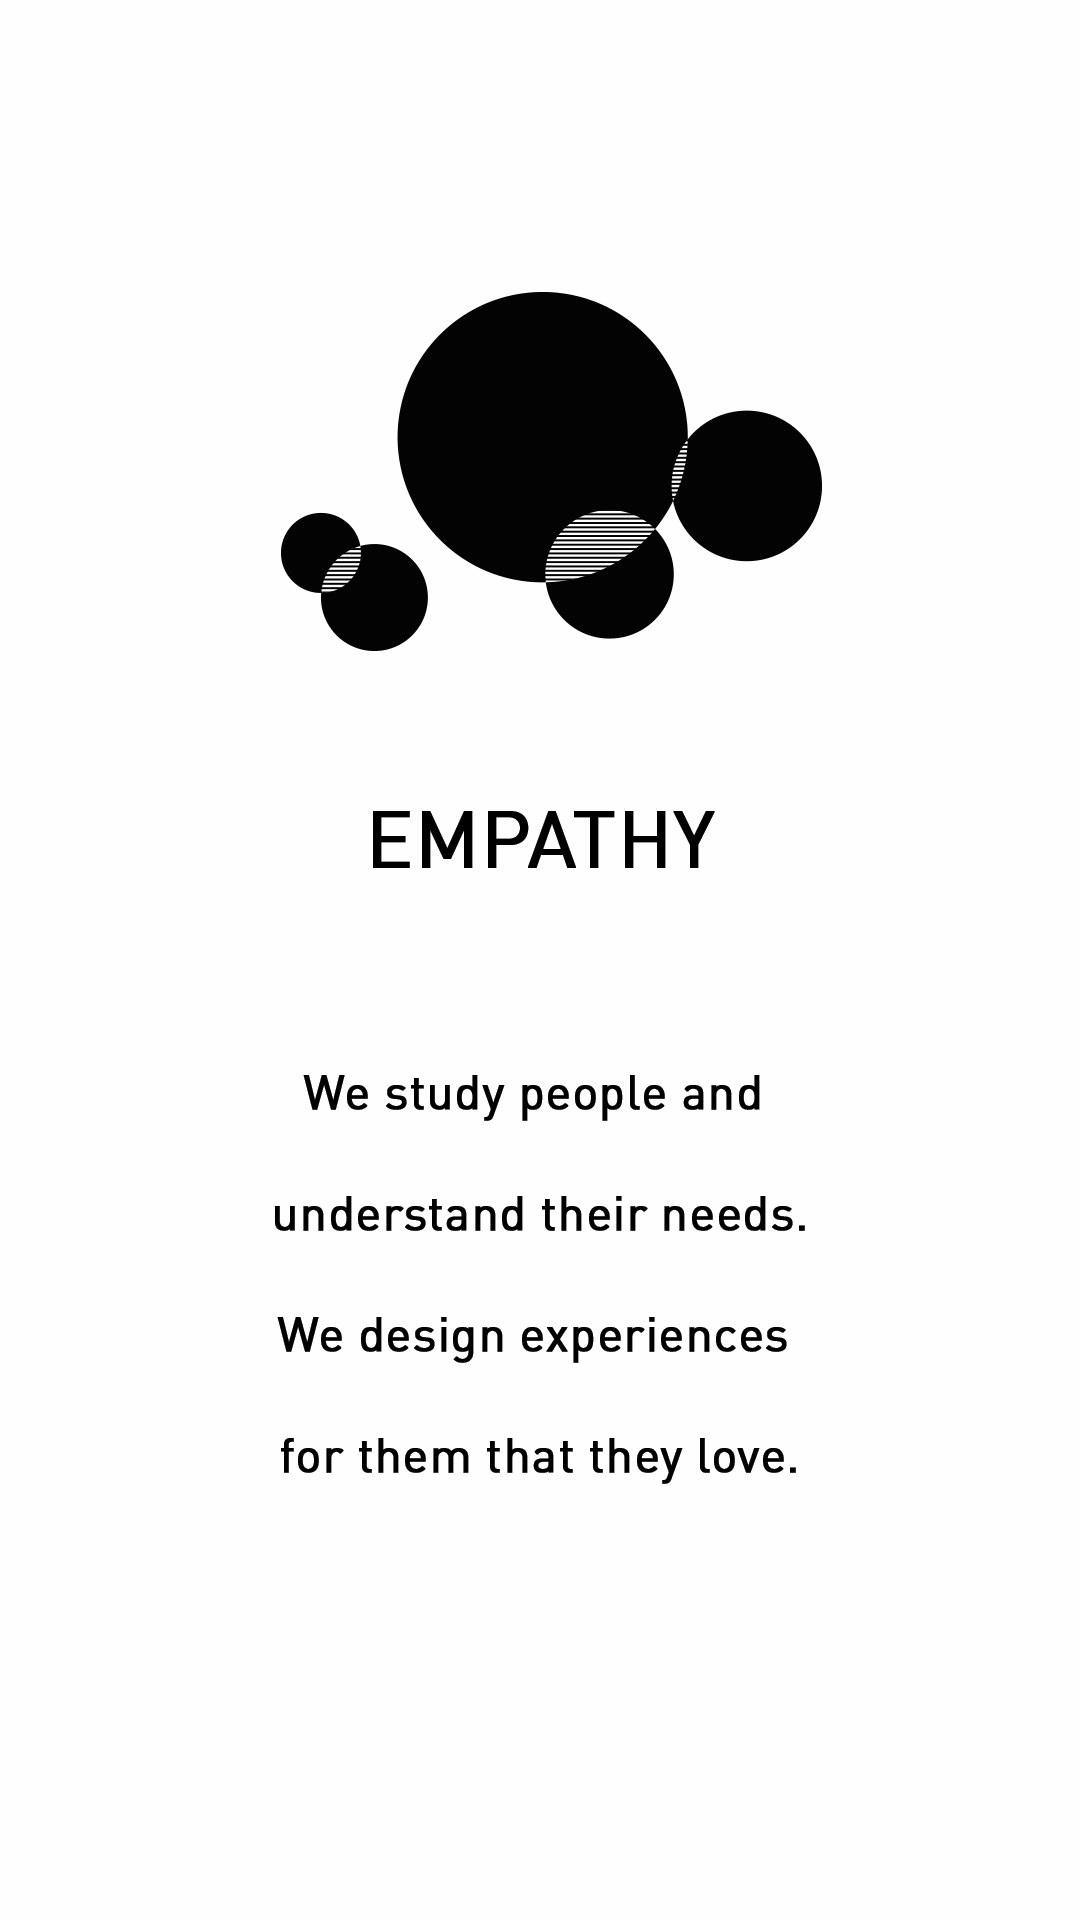 Entwurfreich Core Value Empathy